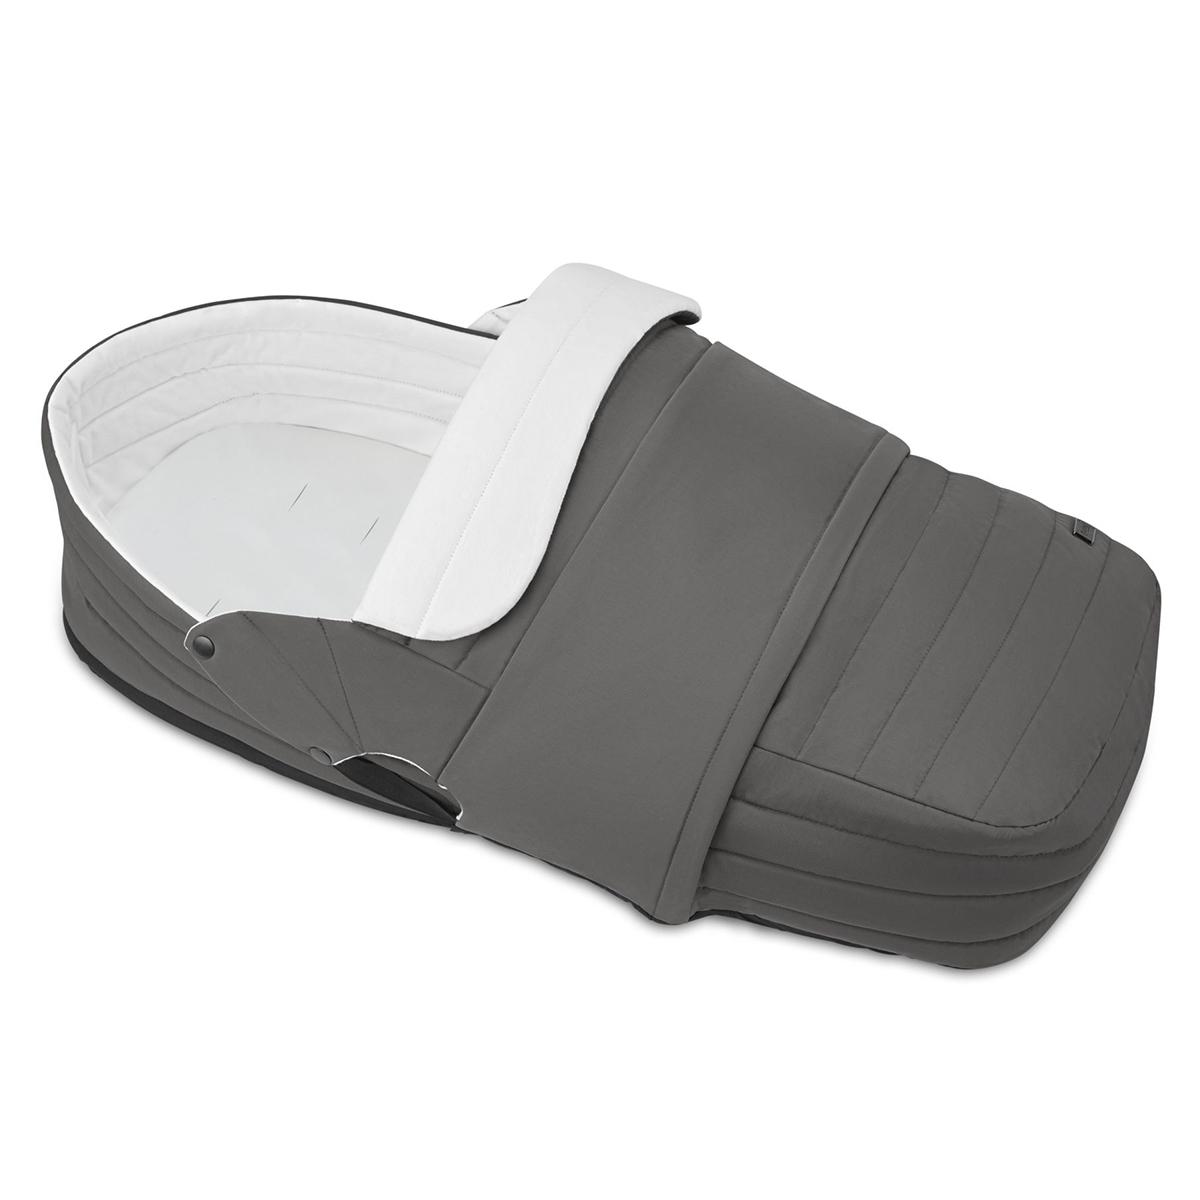 Nacelle Lite Cot - Soho Grey Lite Cot - Soho Grey